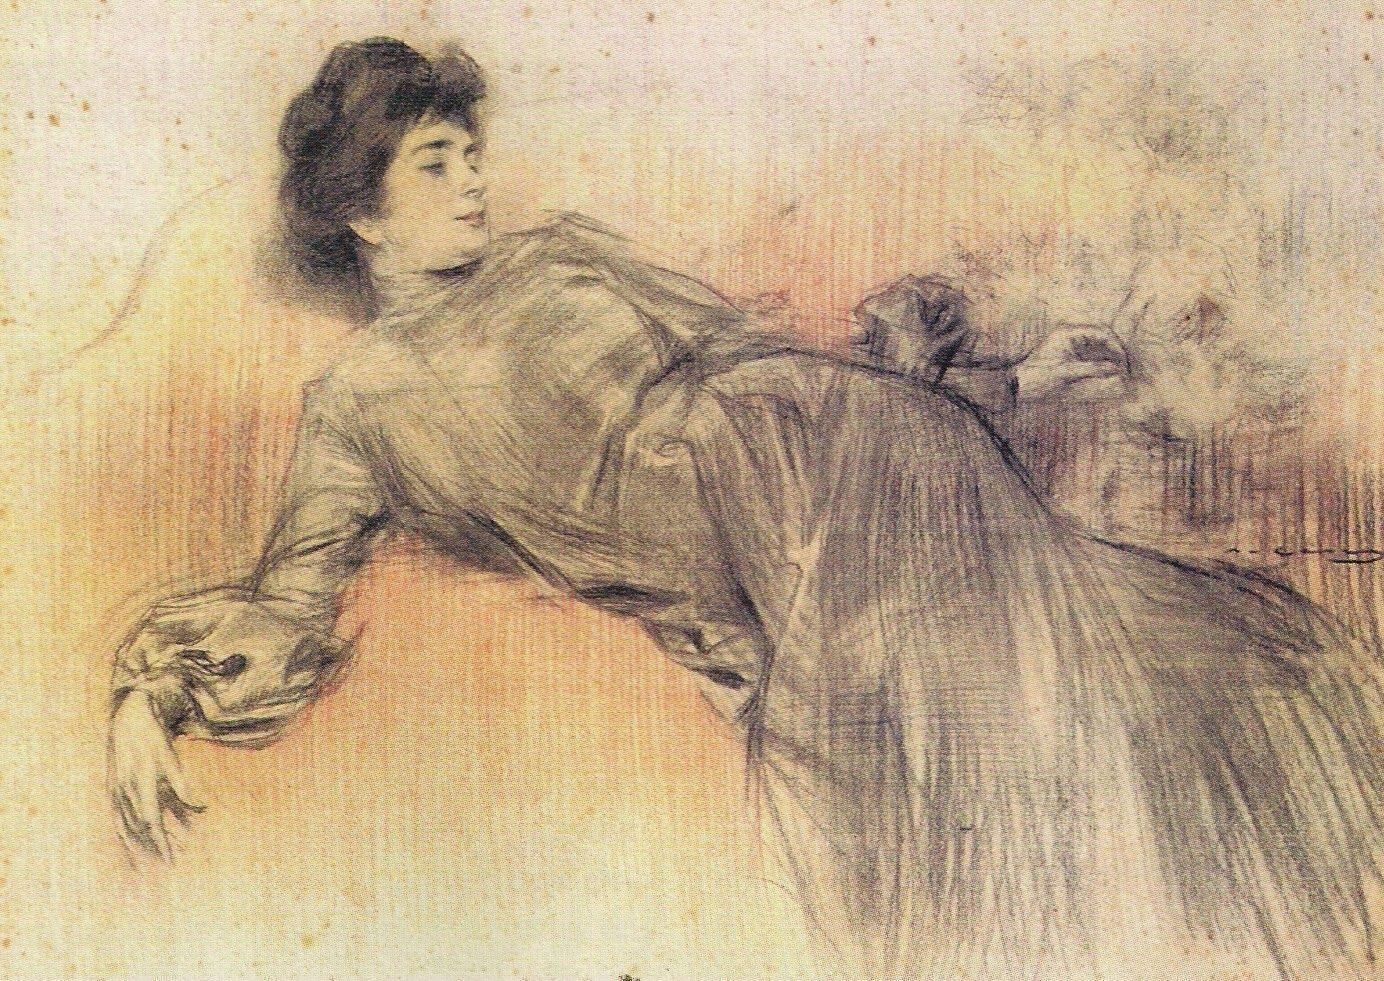 Ramón Martí Alsina, La migdiada, 1884.